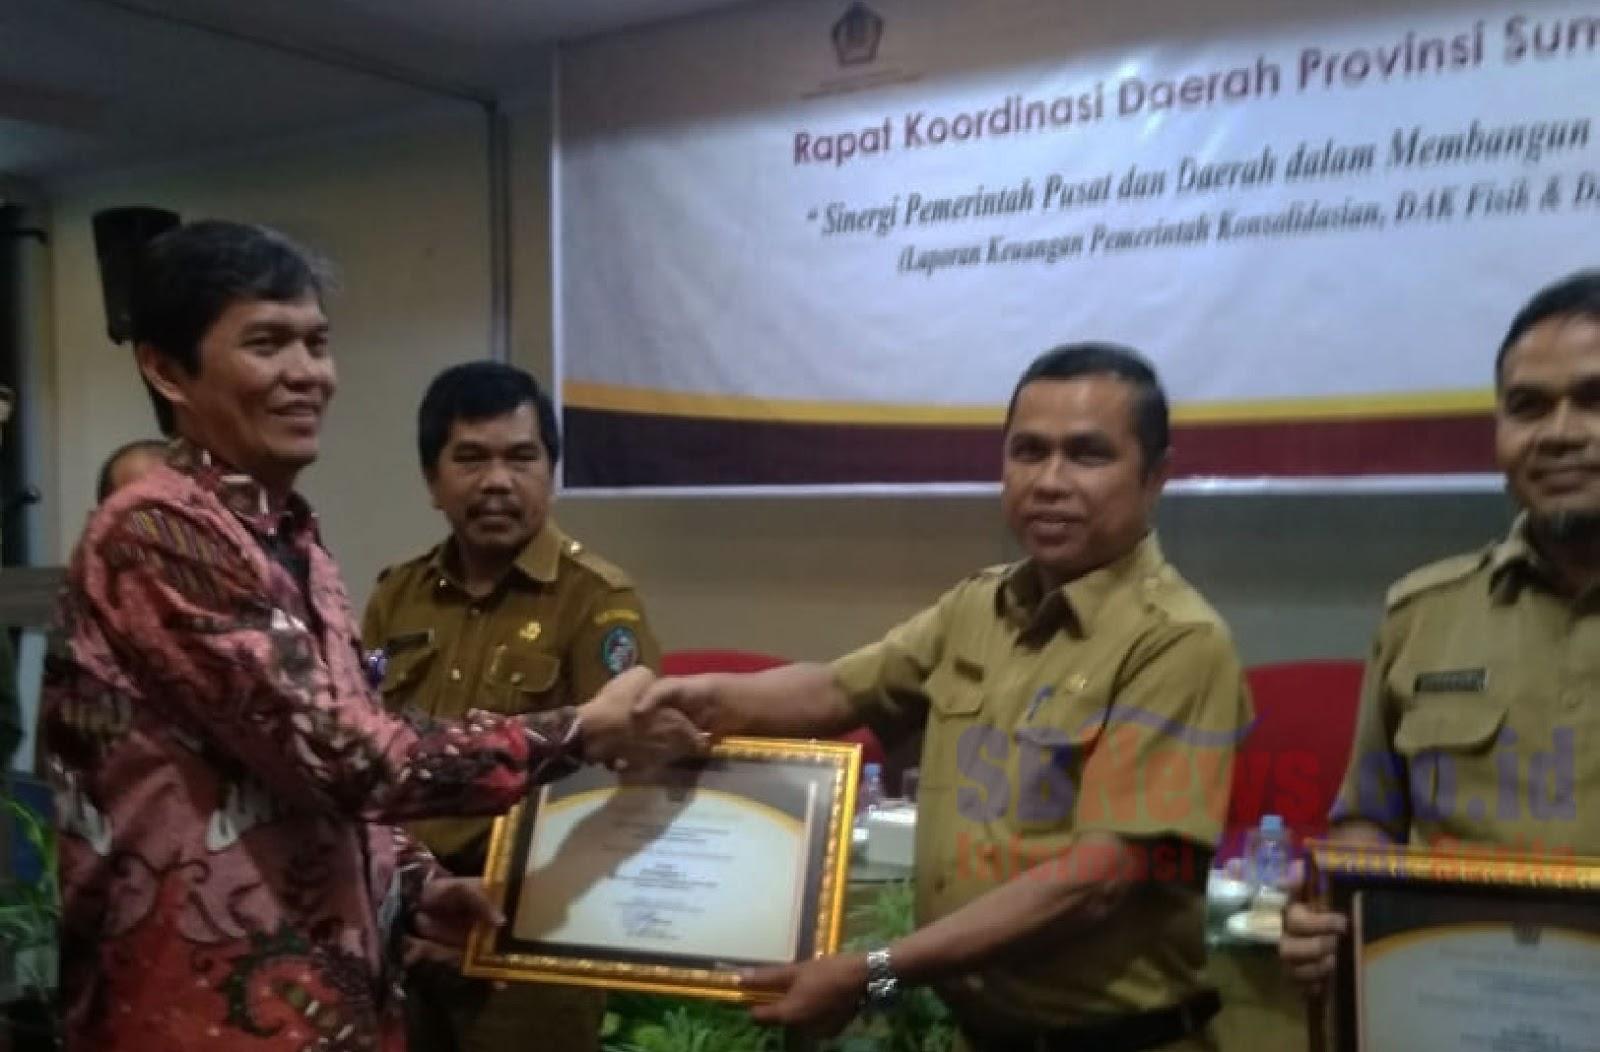 Luar Biasa Hari Ini Pemko Sawahlunto Raih Peringkat 1 Pengelola Produk Ukm Bumn Bella Dan Balon Merah Ade Rohman Kepala Kanwil Dirjen Perbendaharaan Provinsi Sumatera Barat Kiri Menyerahkan Penghargaan Untuk Kepada H Buyung Lapaussos